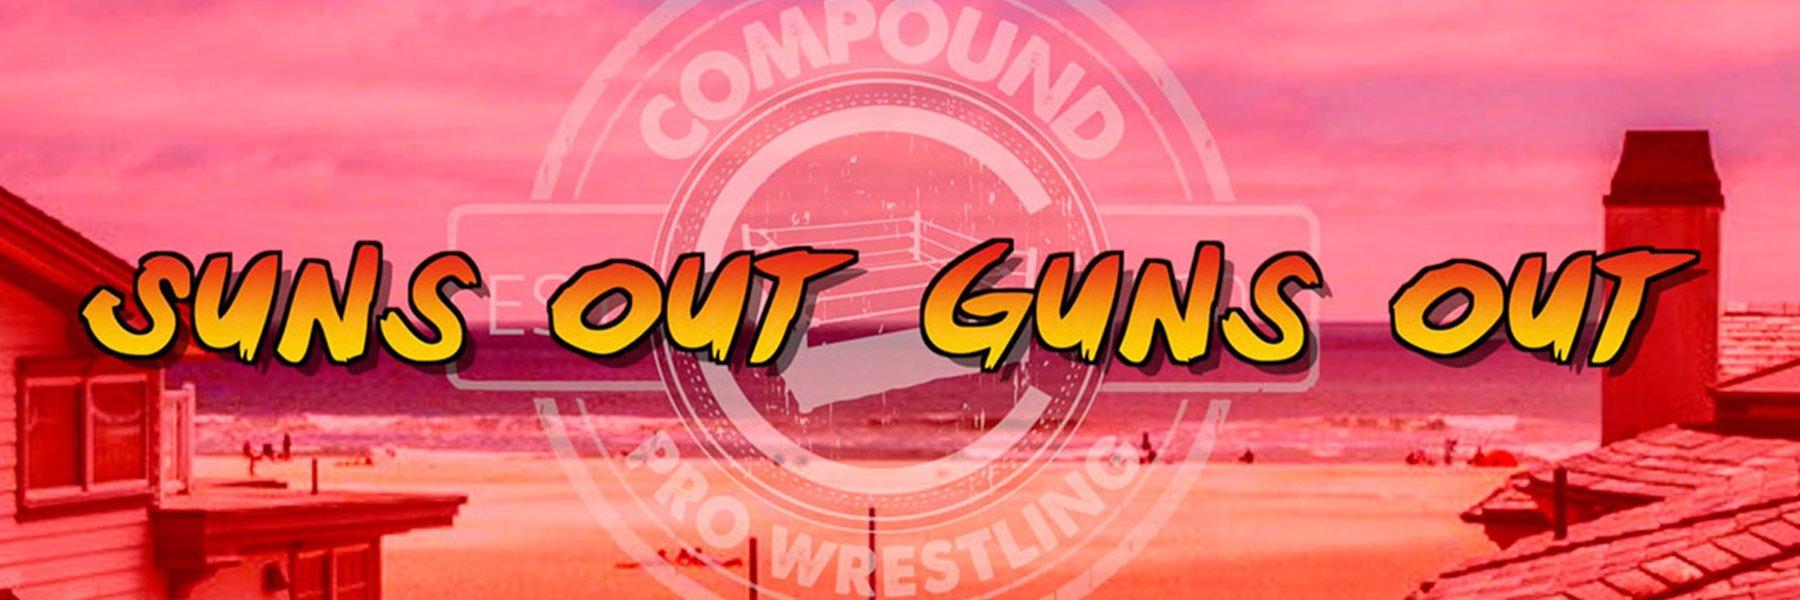 6/22/18:  Suns Out Guns Out